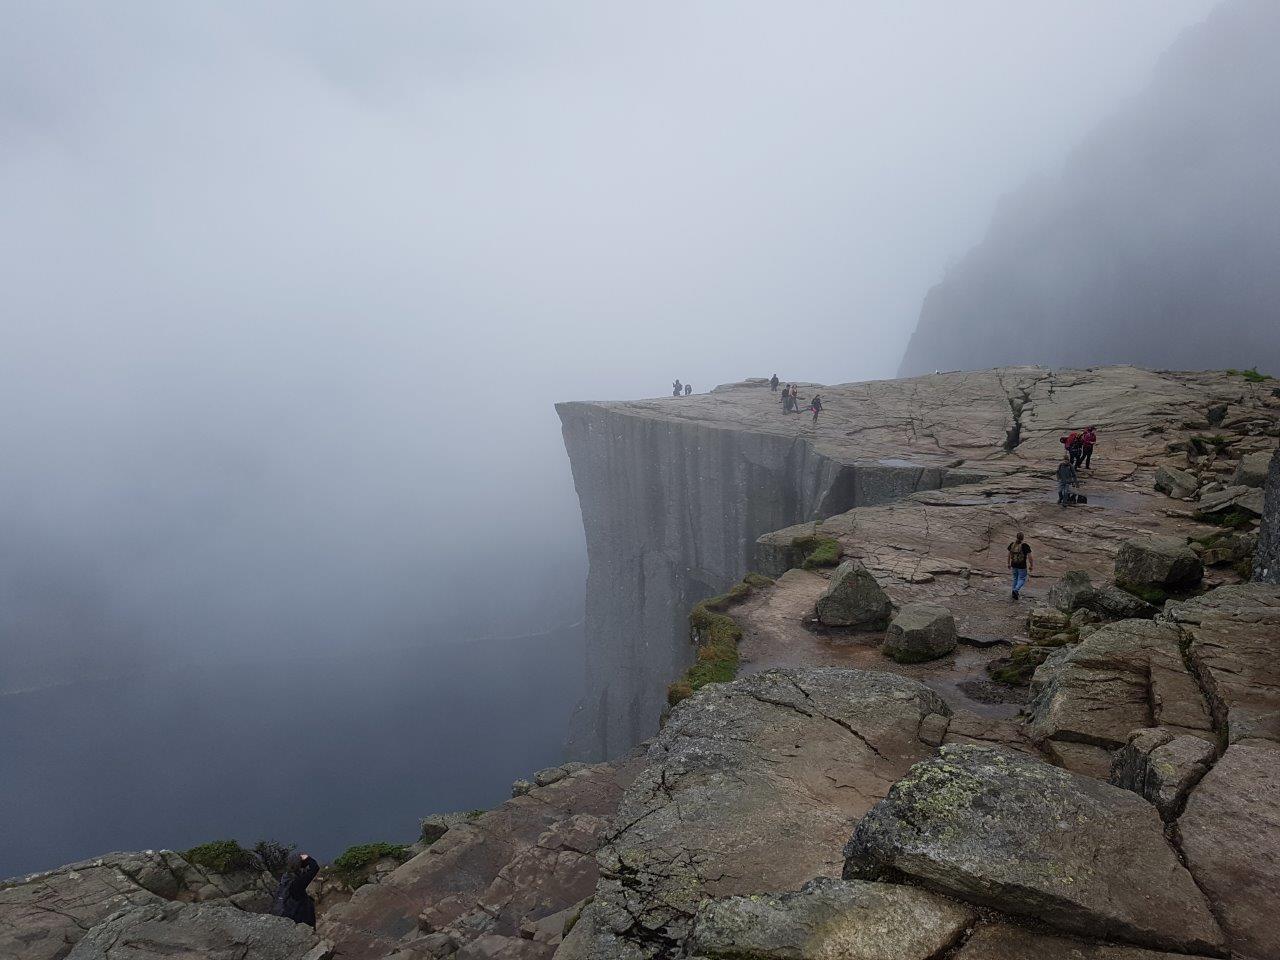 Preikestolen - Lysefjorden - Nasjonal Turiststi - Miljødirektoratet - 2020